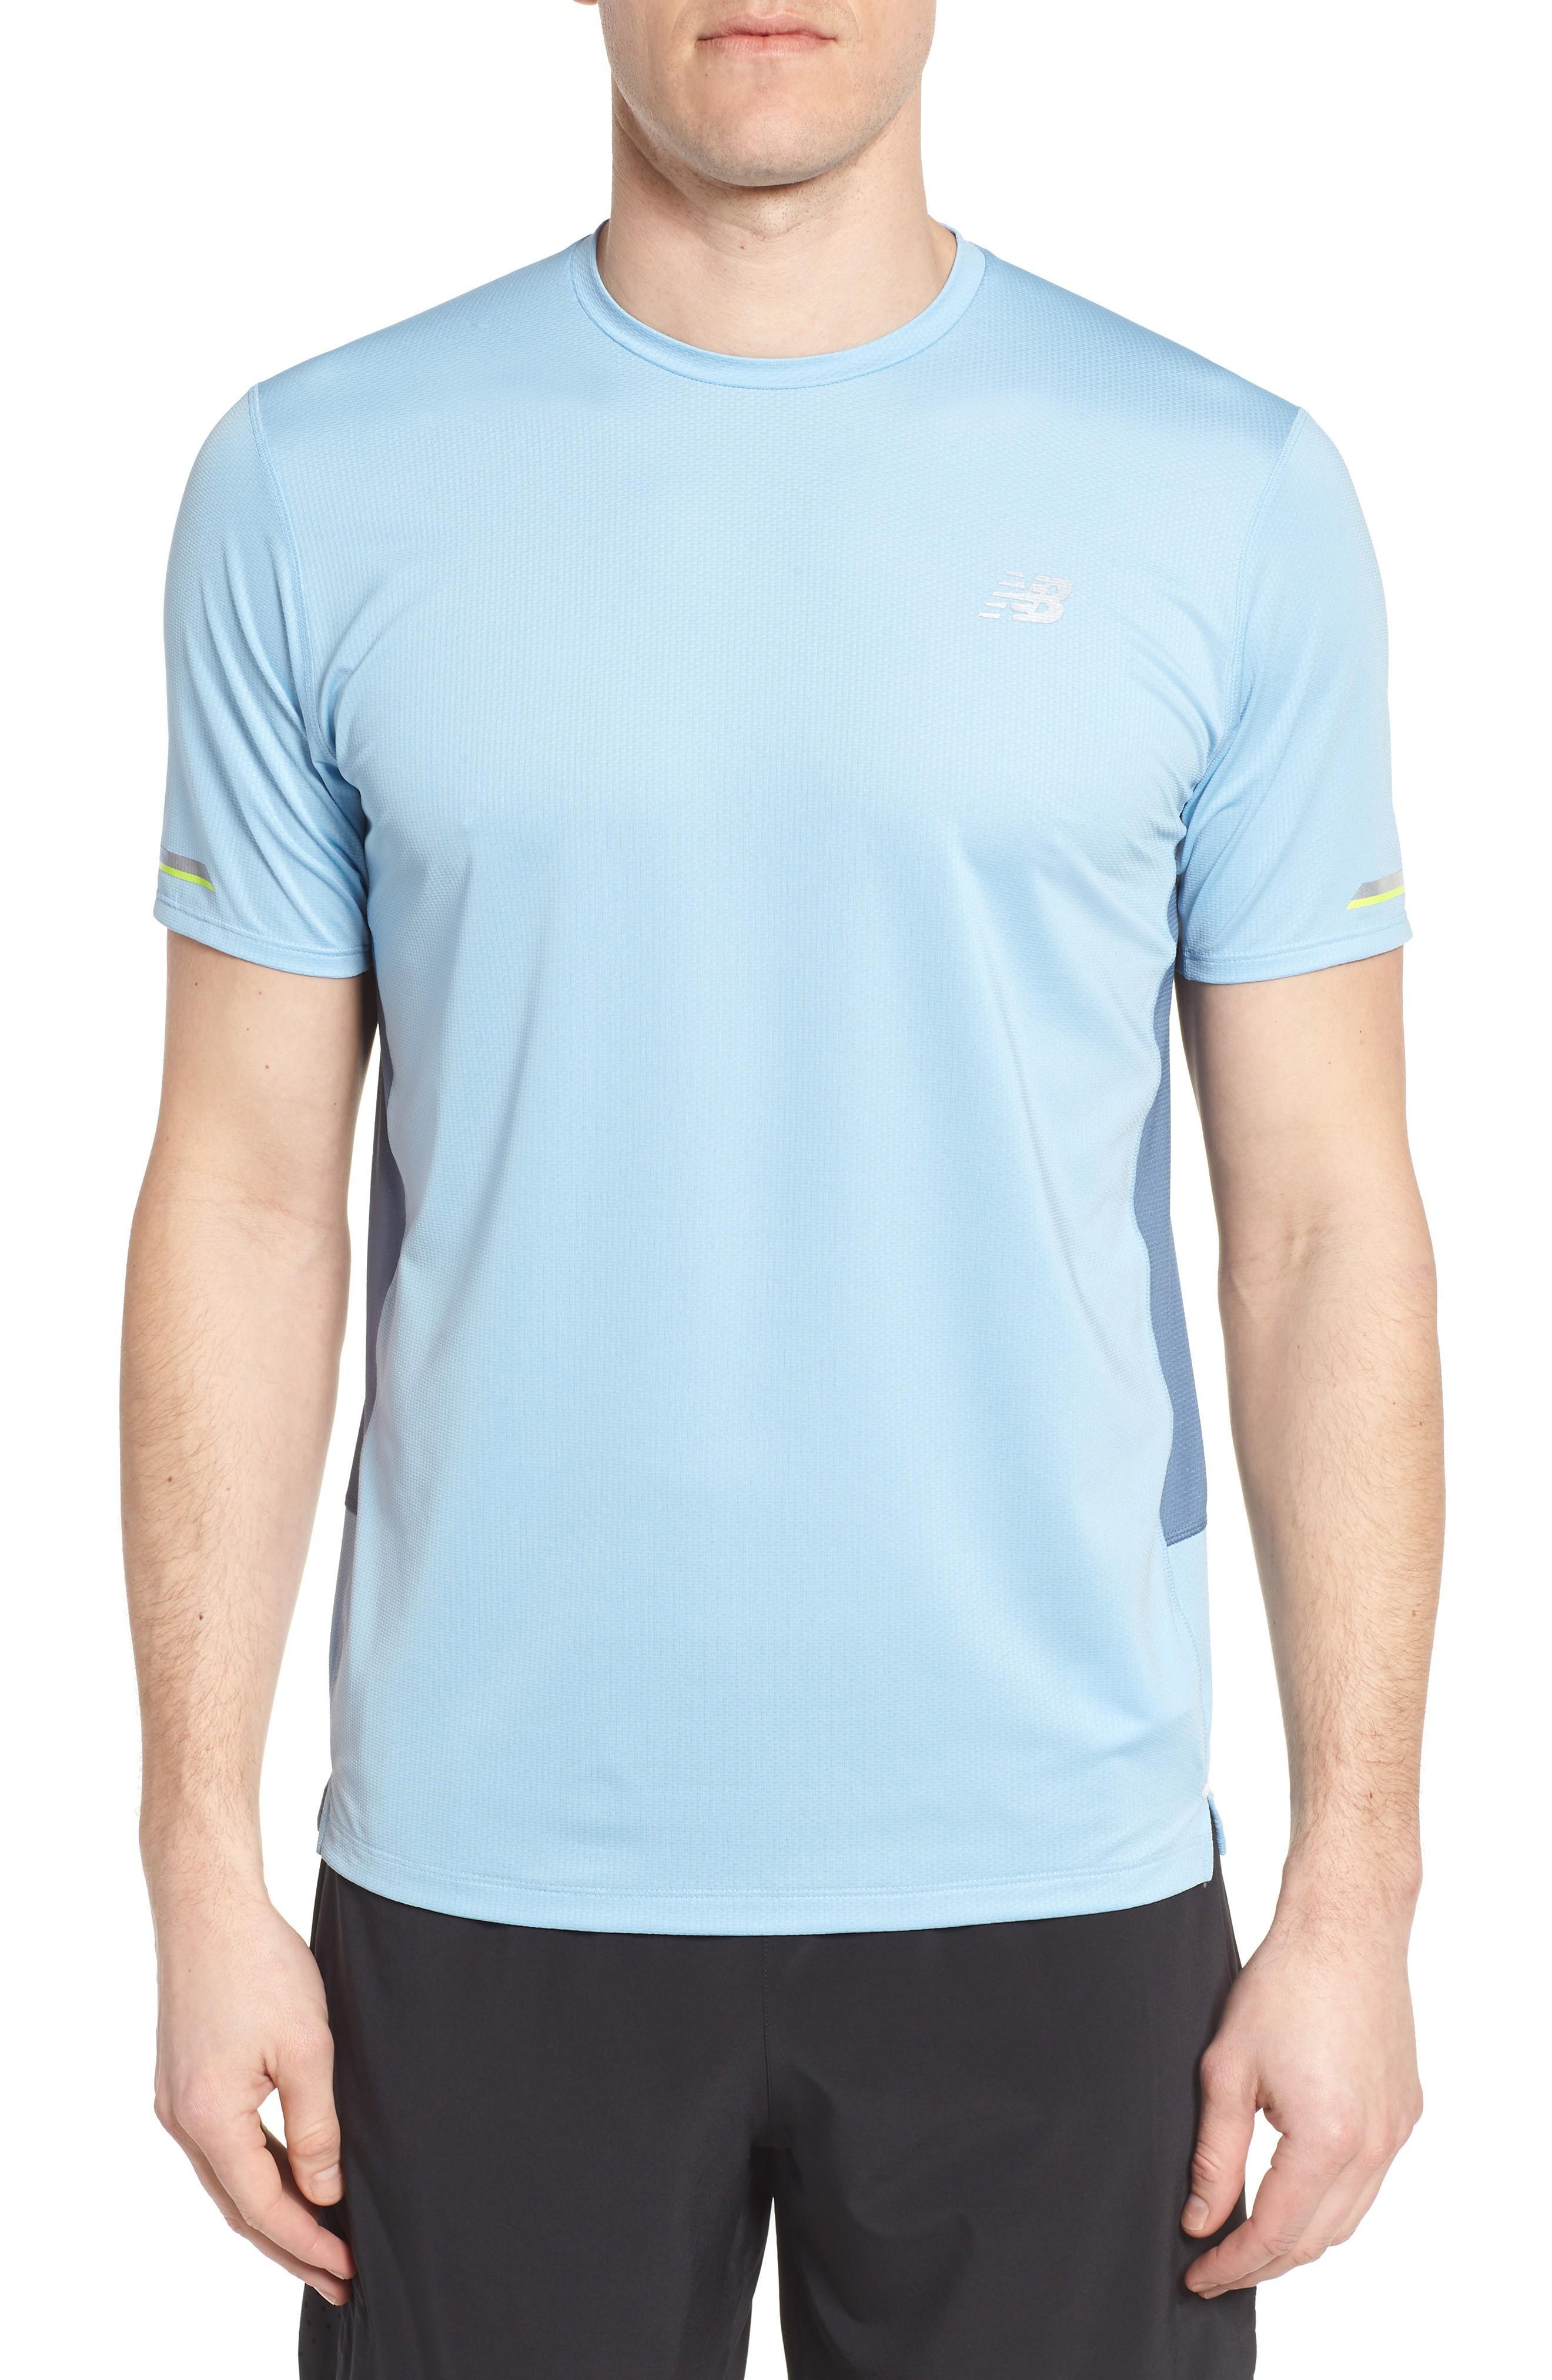 New Balance Ice 2.0 Crewneck T-shirt In Clear Sky